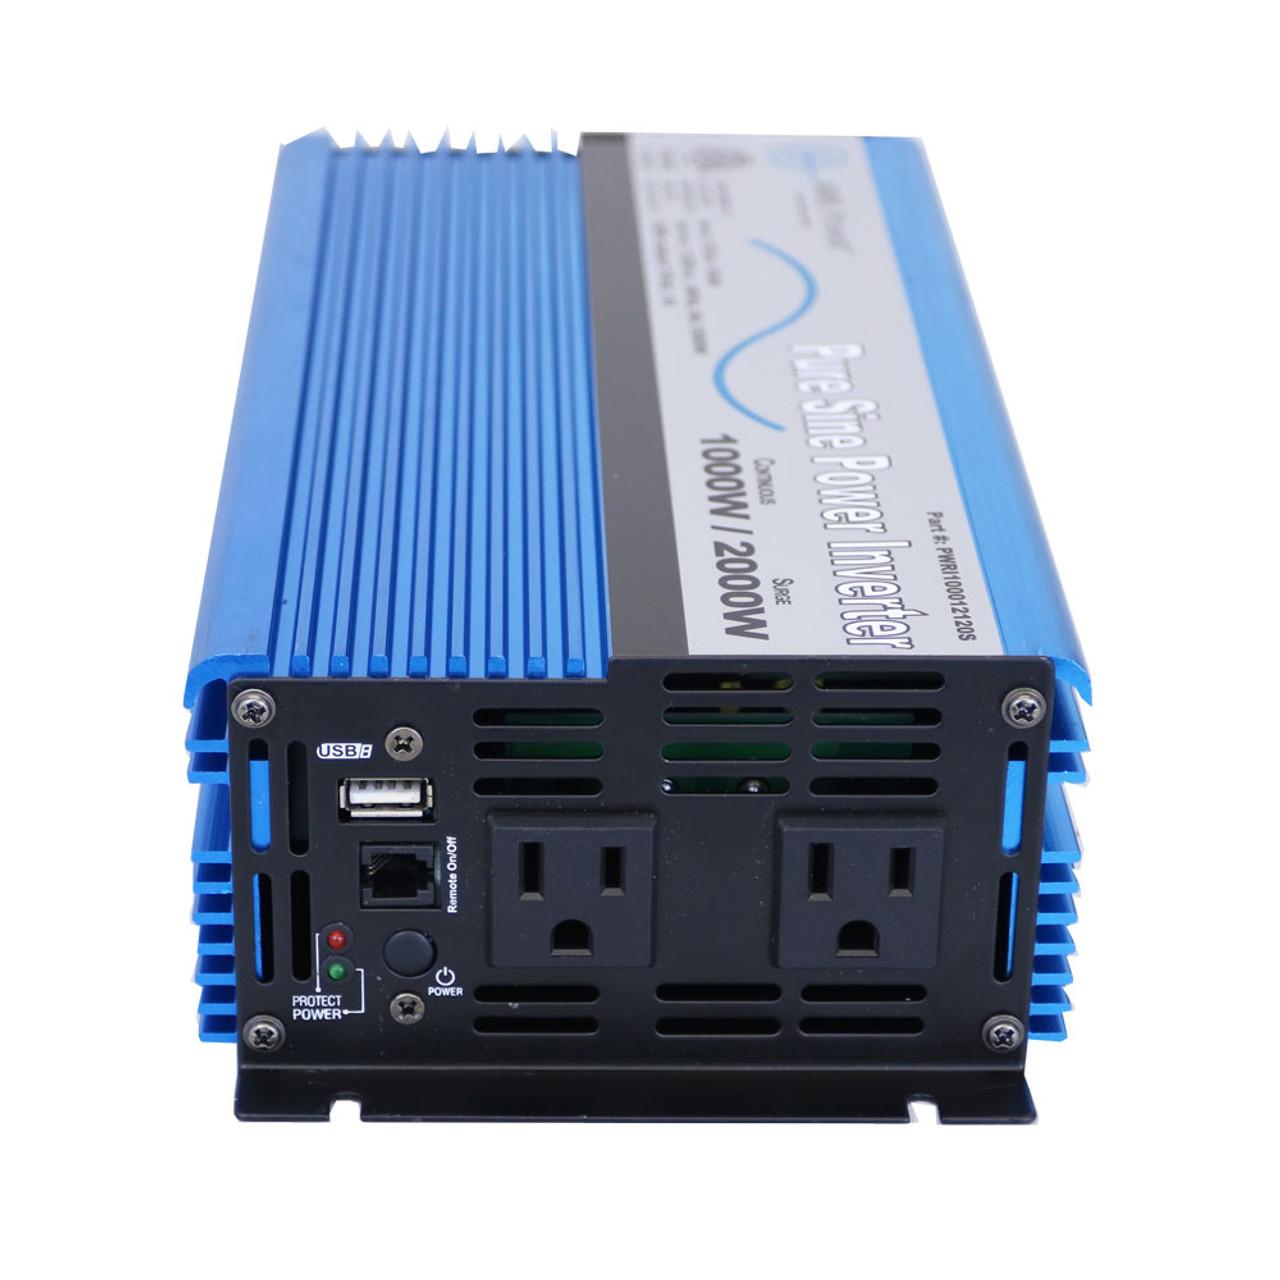 AIMS 1000 Watt Pure Sine Power Inverter 12 Volt ETL Listed to UL 458